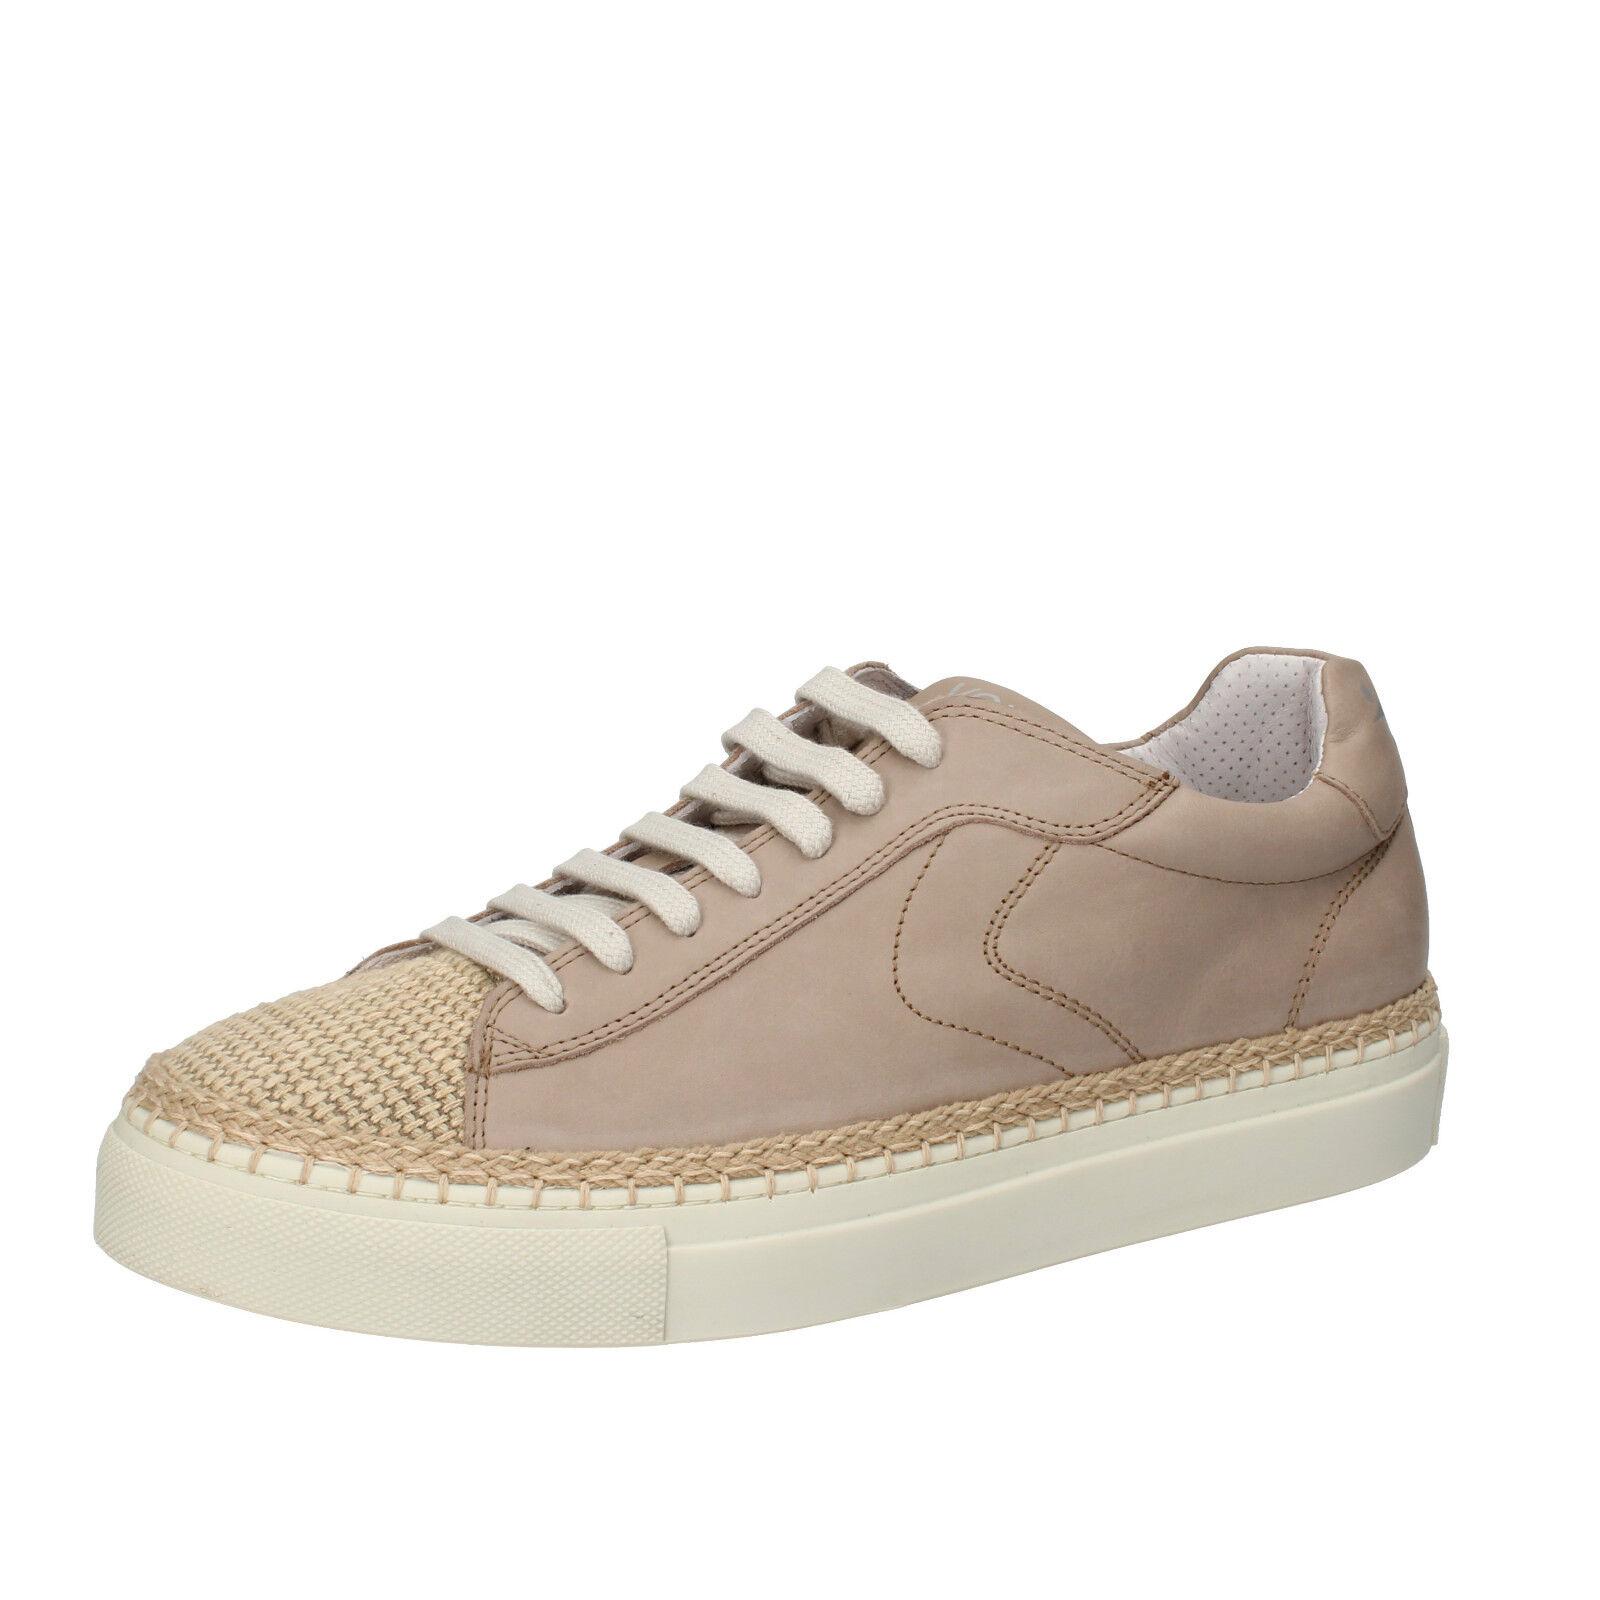 Herren schuhe VOILE BLANCHE 45 EU Sneakers beige leder Textil AC600-H